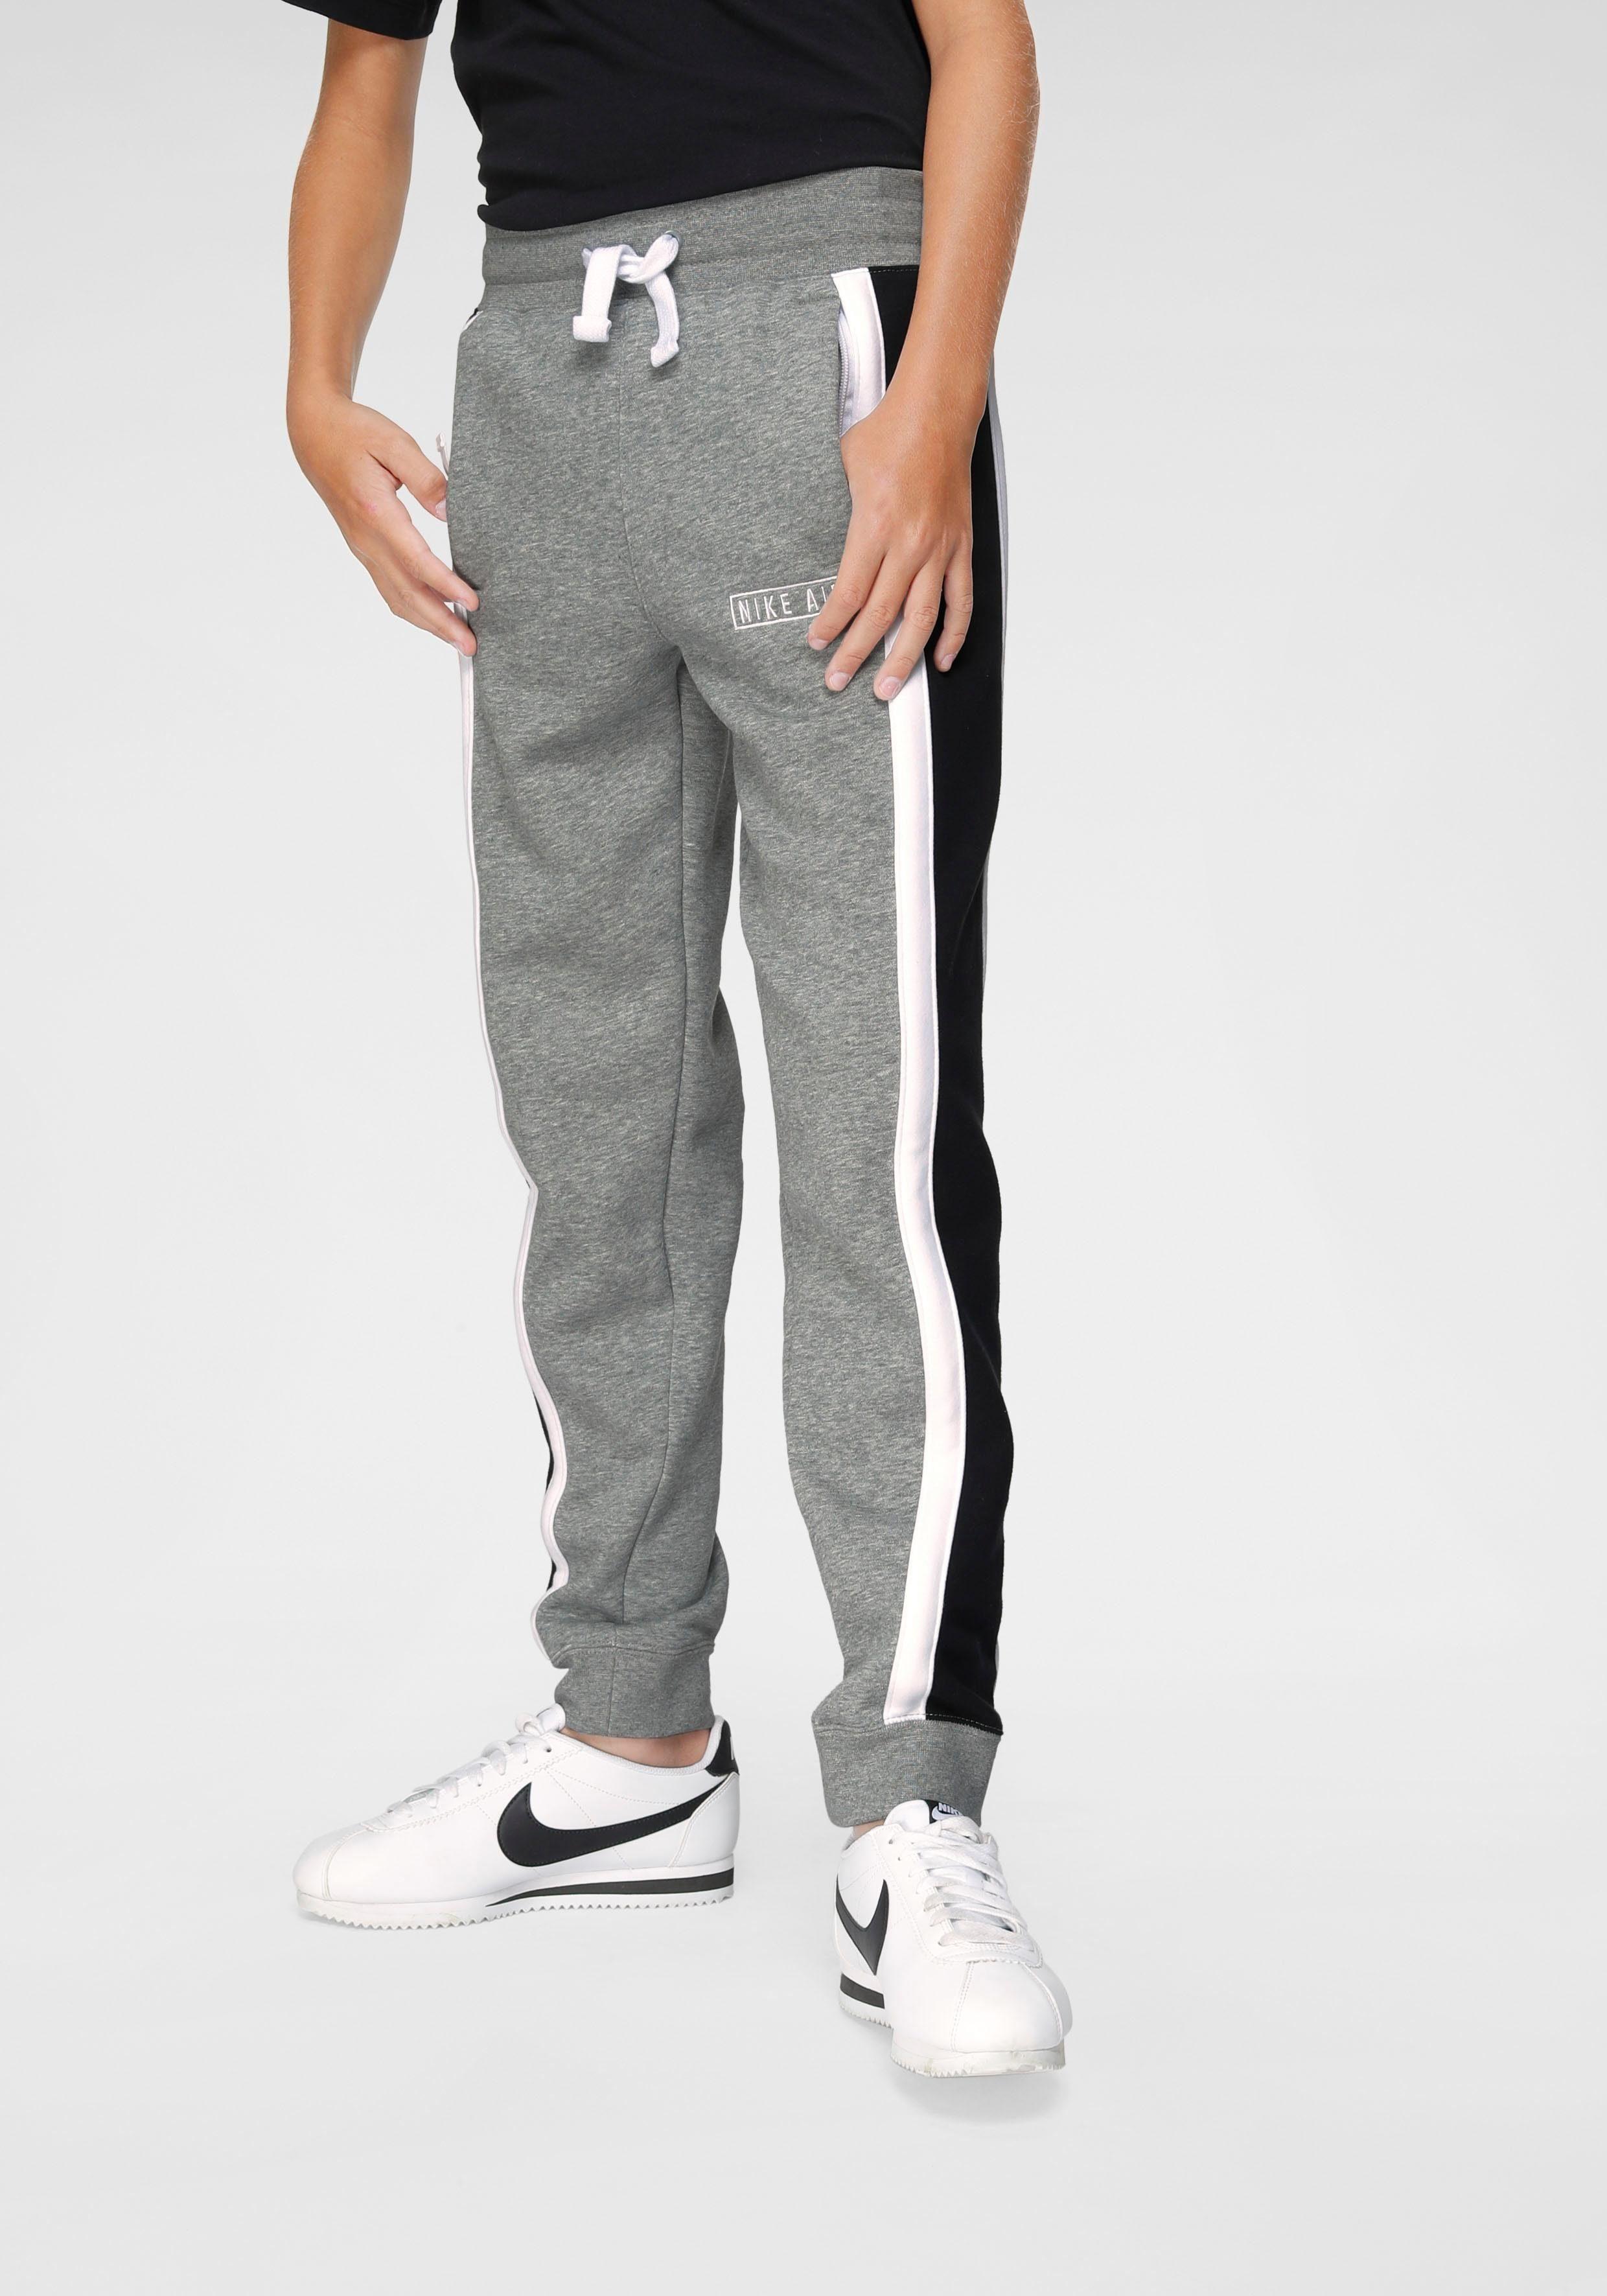 Nike Sportswear Jogginghose »BOYS NIKE AIR PANT«, Jogginghose von NIKE Sportswear online kaufen | OTTO